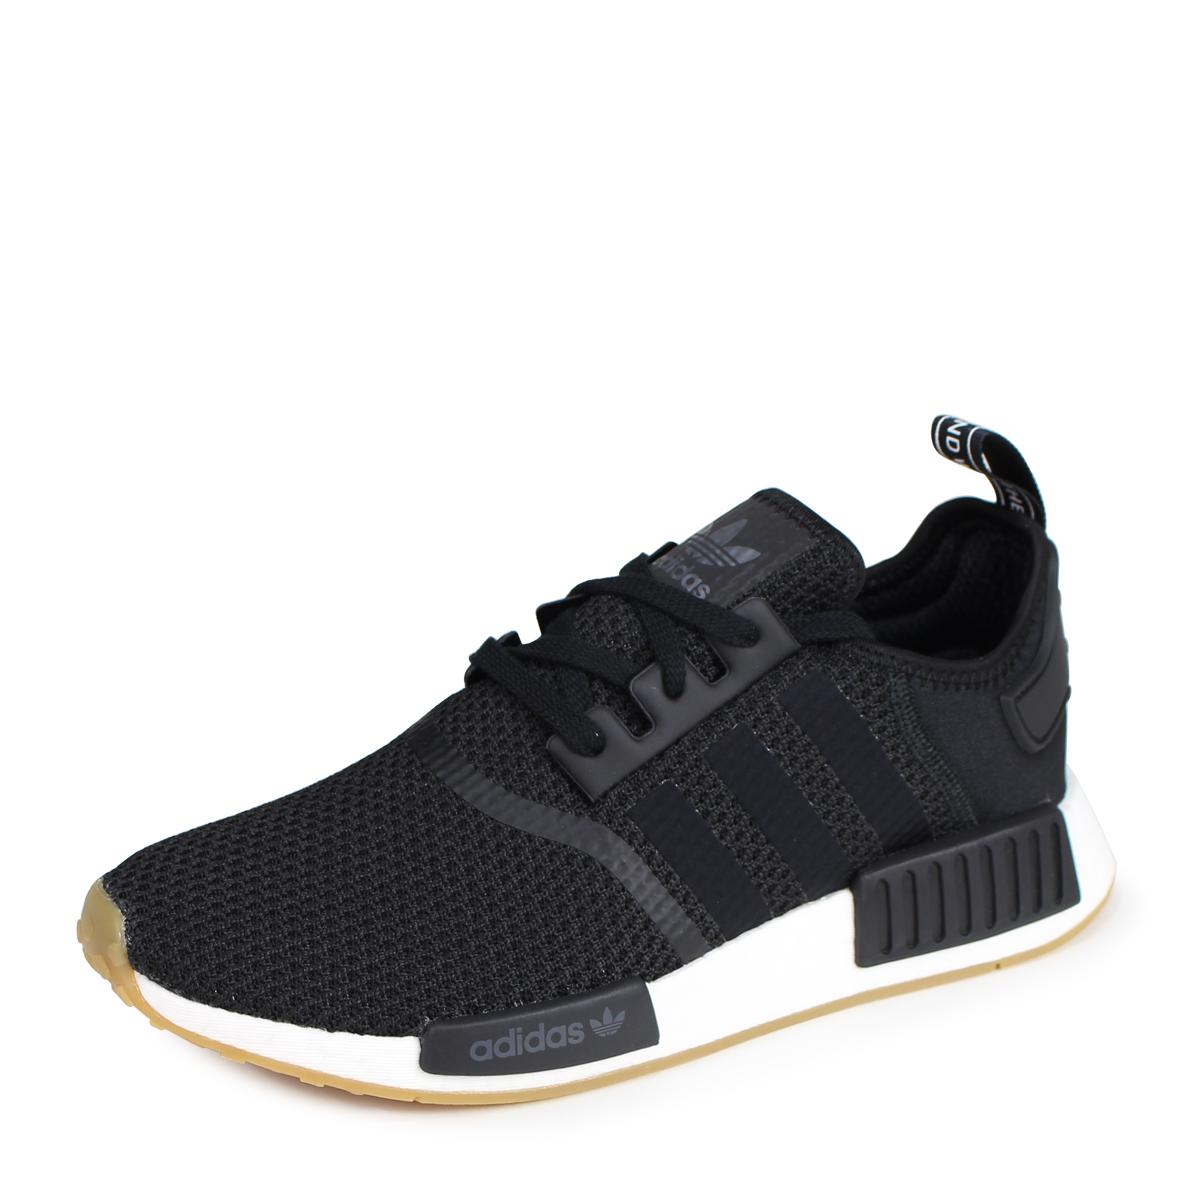 wholesale dealer e92fc 404f8 adidas Originals NMD R1 Adidas originals sneakers N M D nomad men B42200  black [7/7 Shinnyu load] [187]